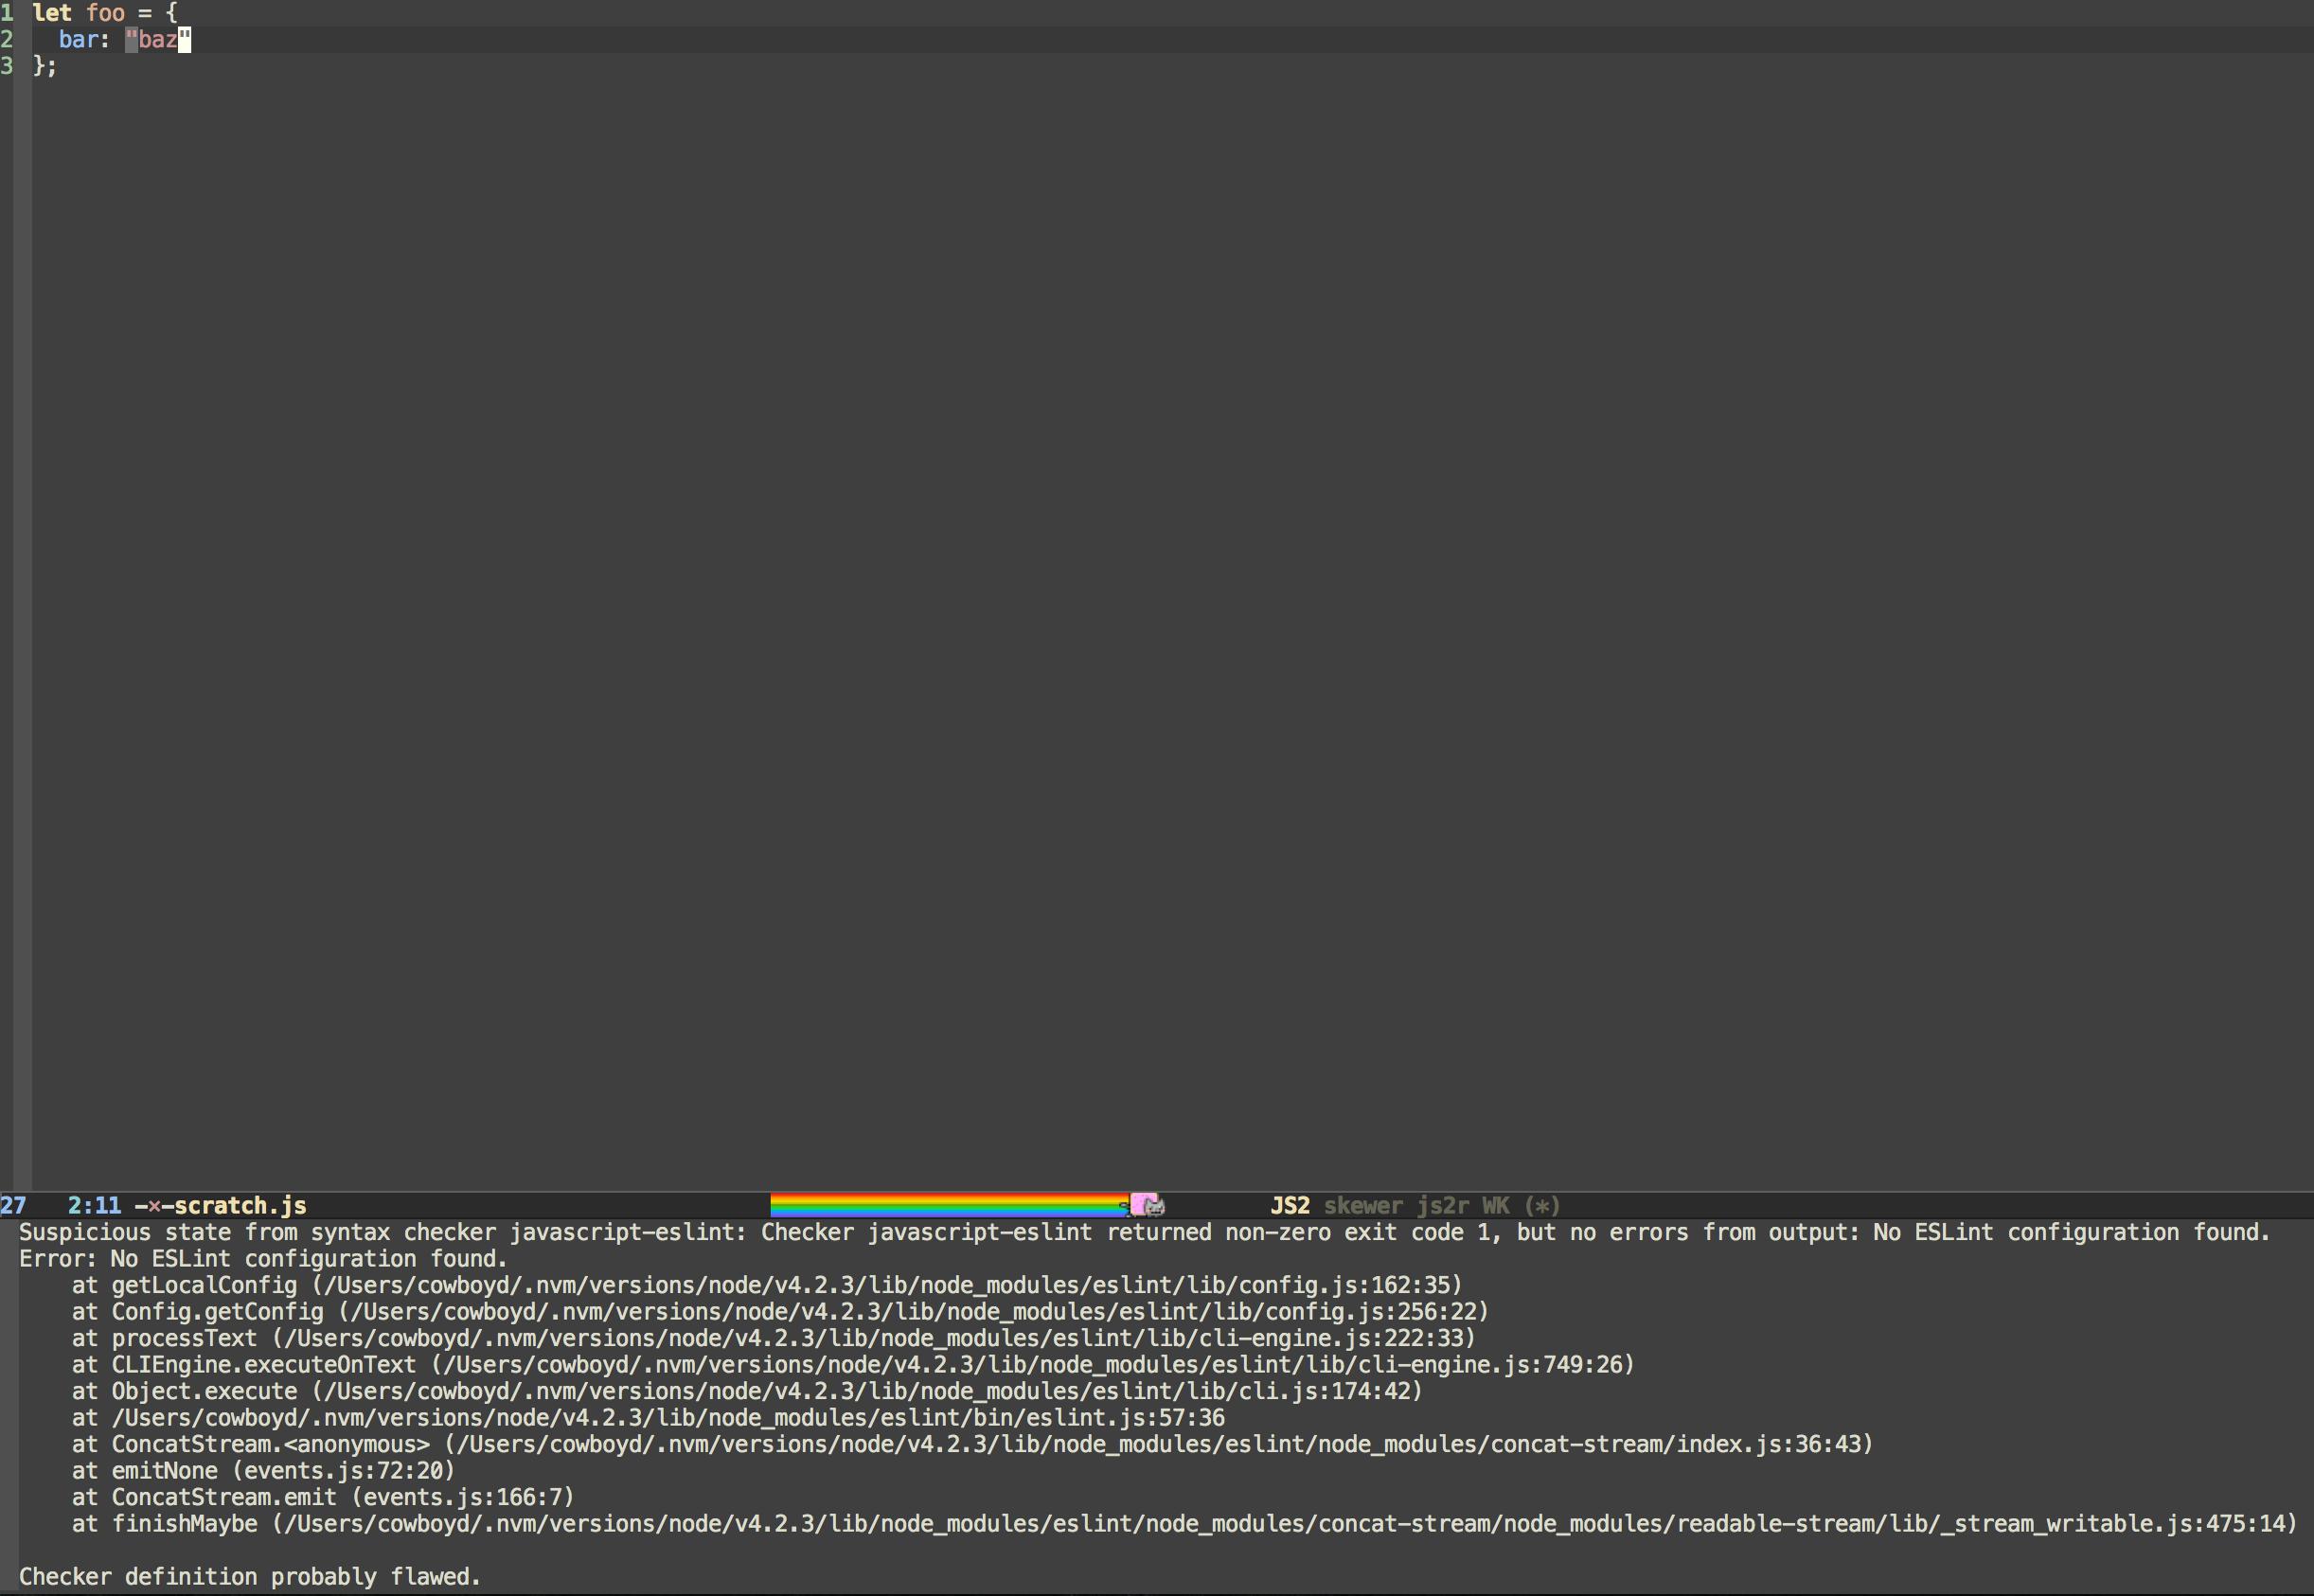 emacs_prelude_-_scratch_js_and_check_buffers_ _flycheck_30-cvs_documentation_